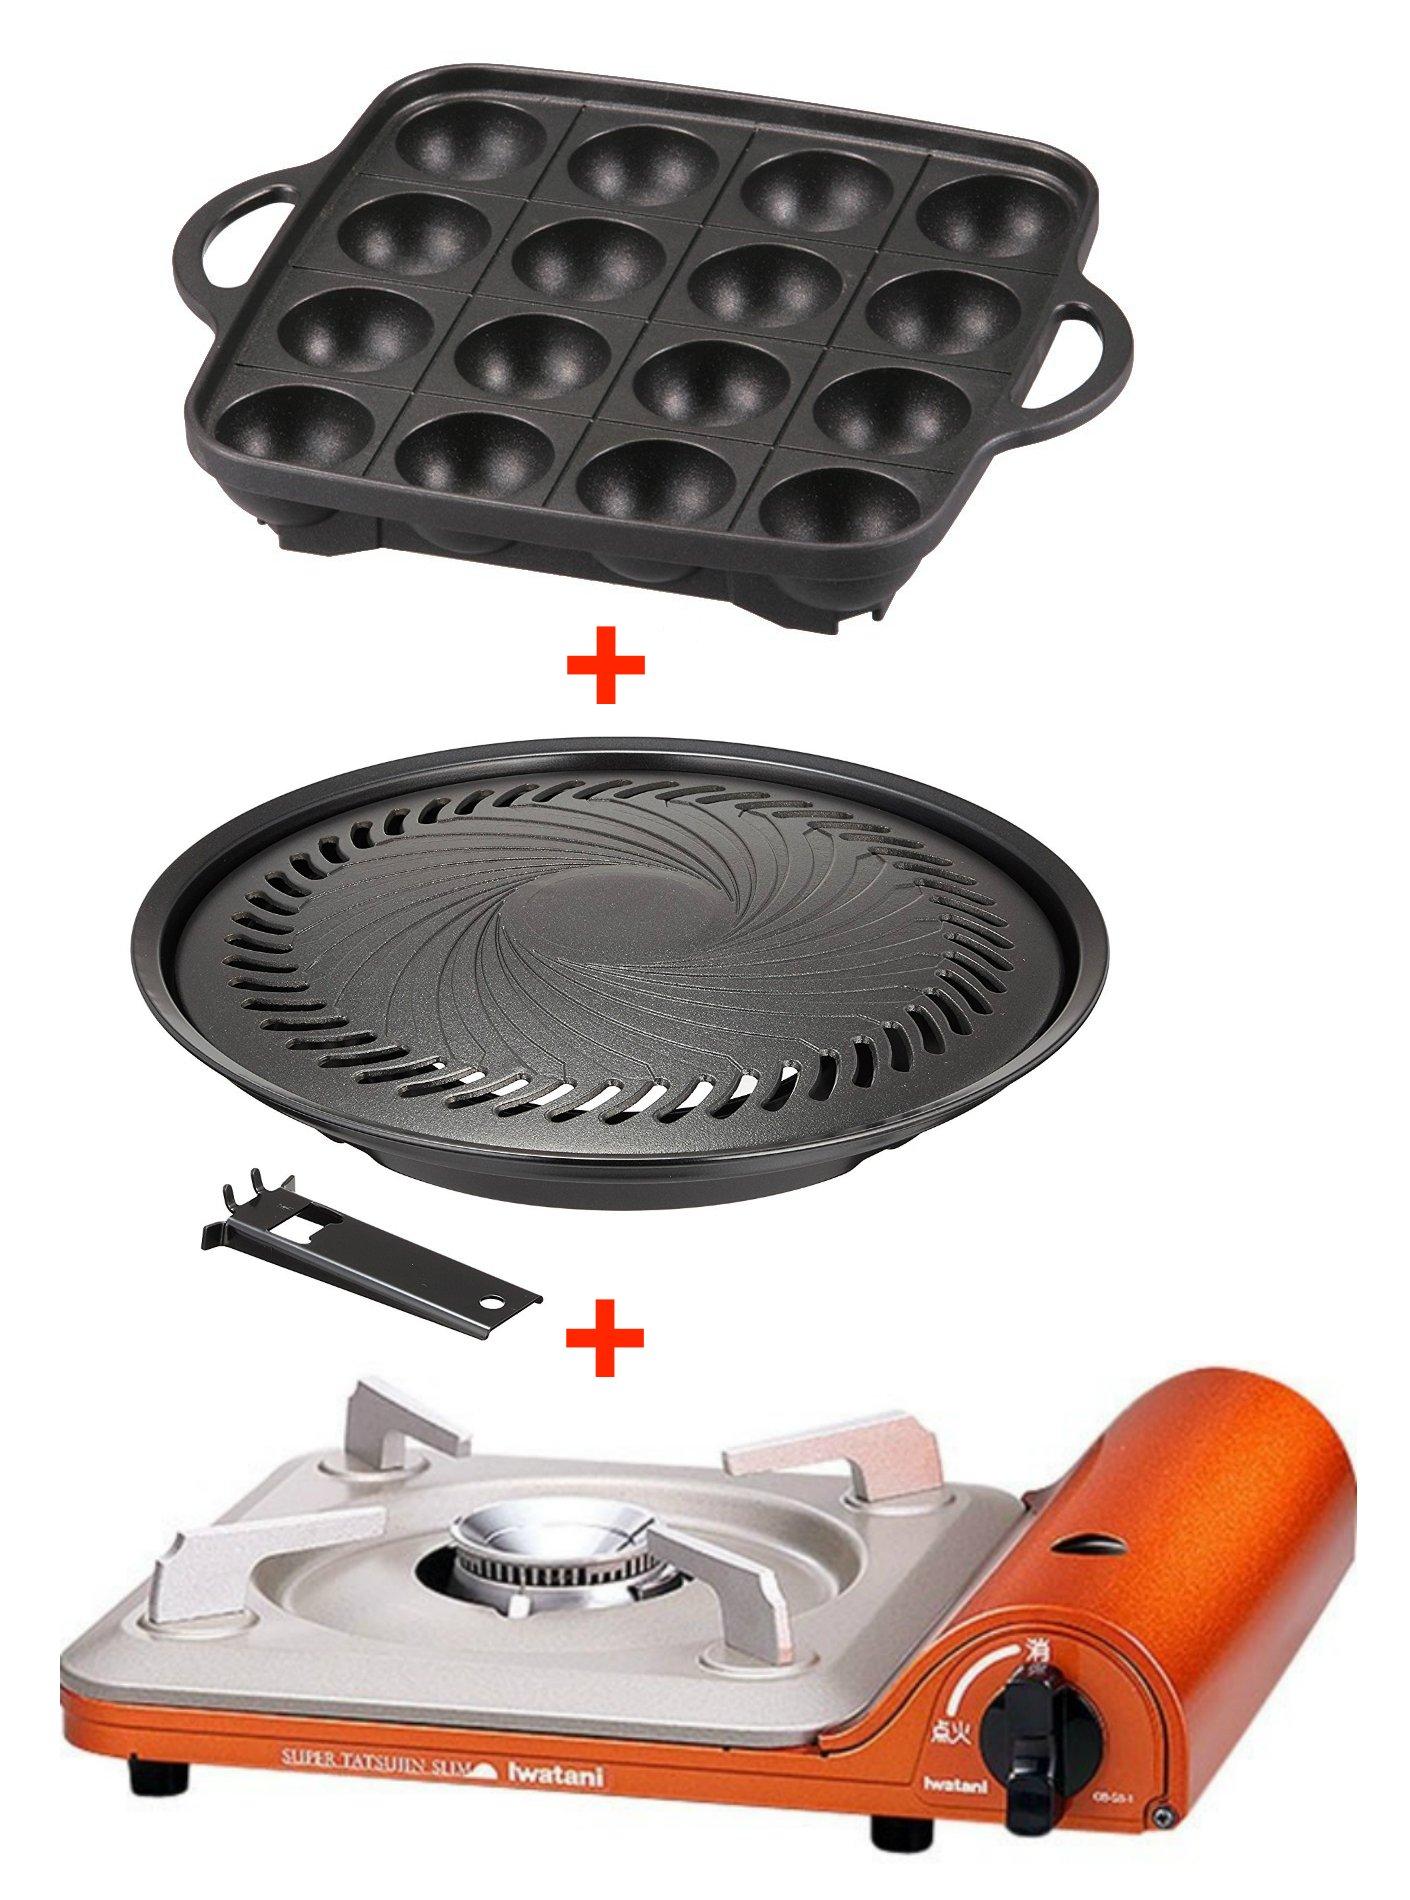 IWATANI Portable BBQ Grill & TAKOYAKI Set - Iwatani Cassette Grill Super Slim Orange CB-SS-1, YAKINIKU Korean BBQ Plate CB-P-Y-3 (Large) & Nonstick Coating TAKOYAKI Plate CB-P-TAF Set